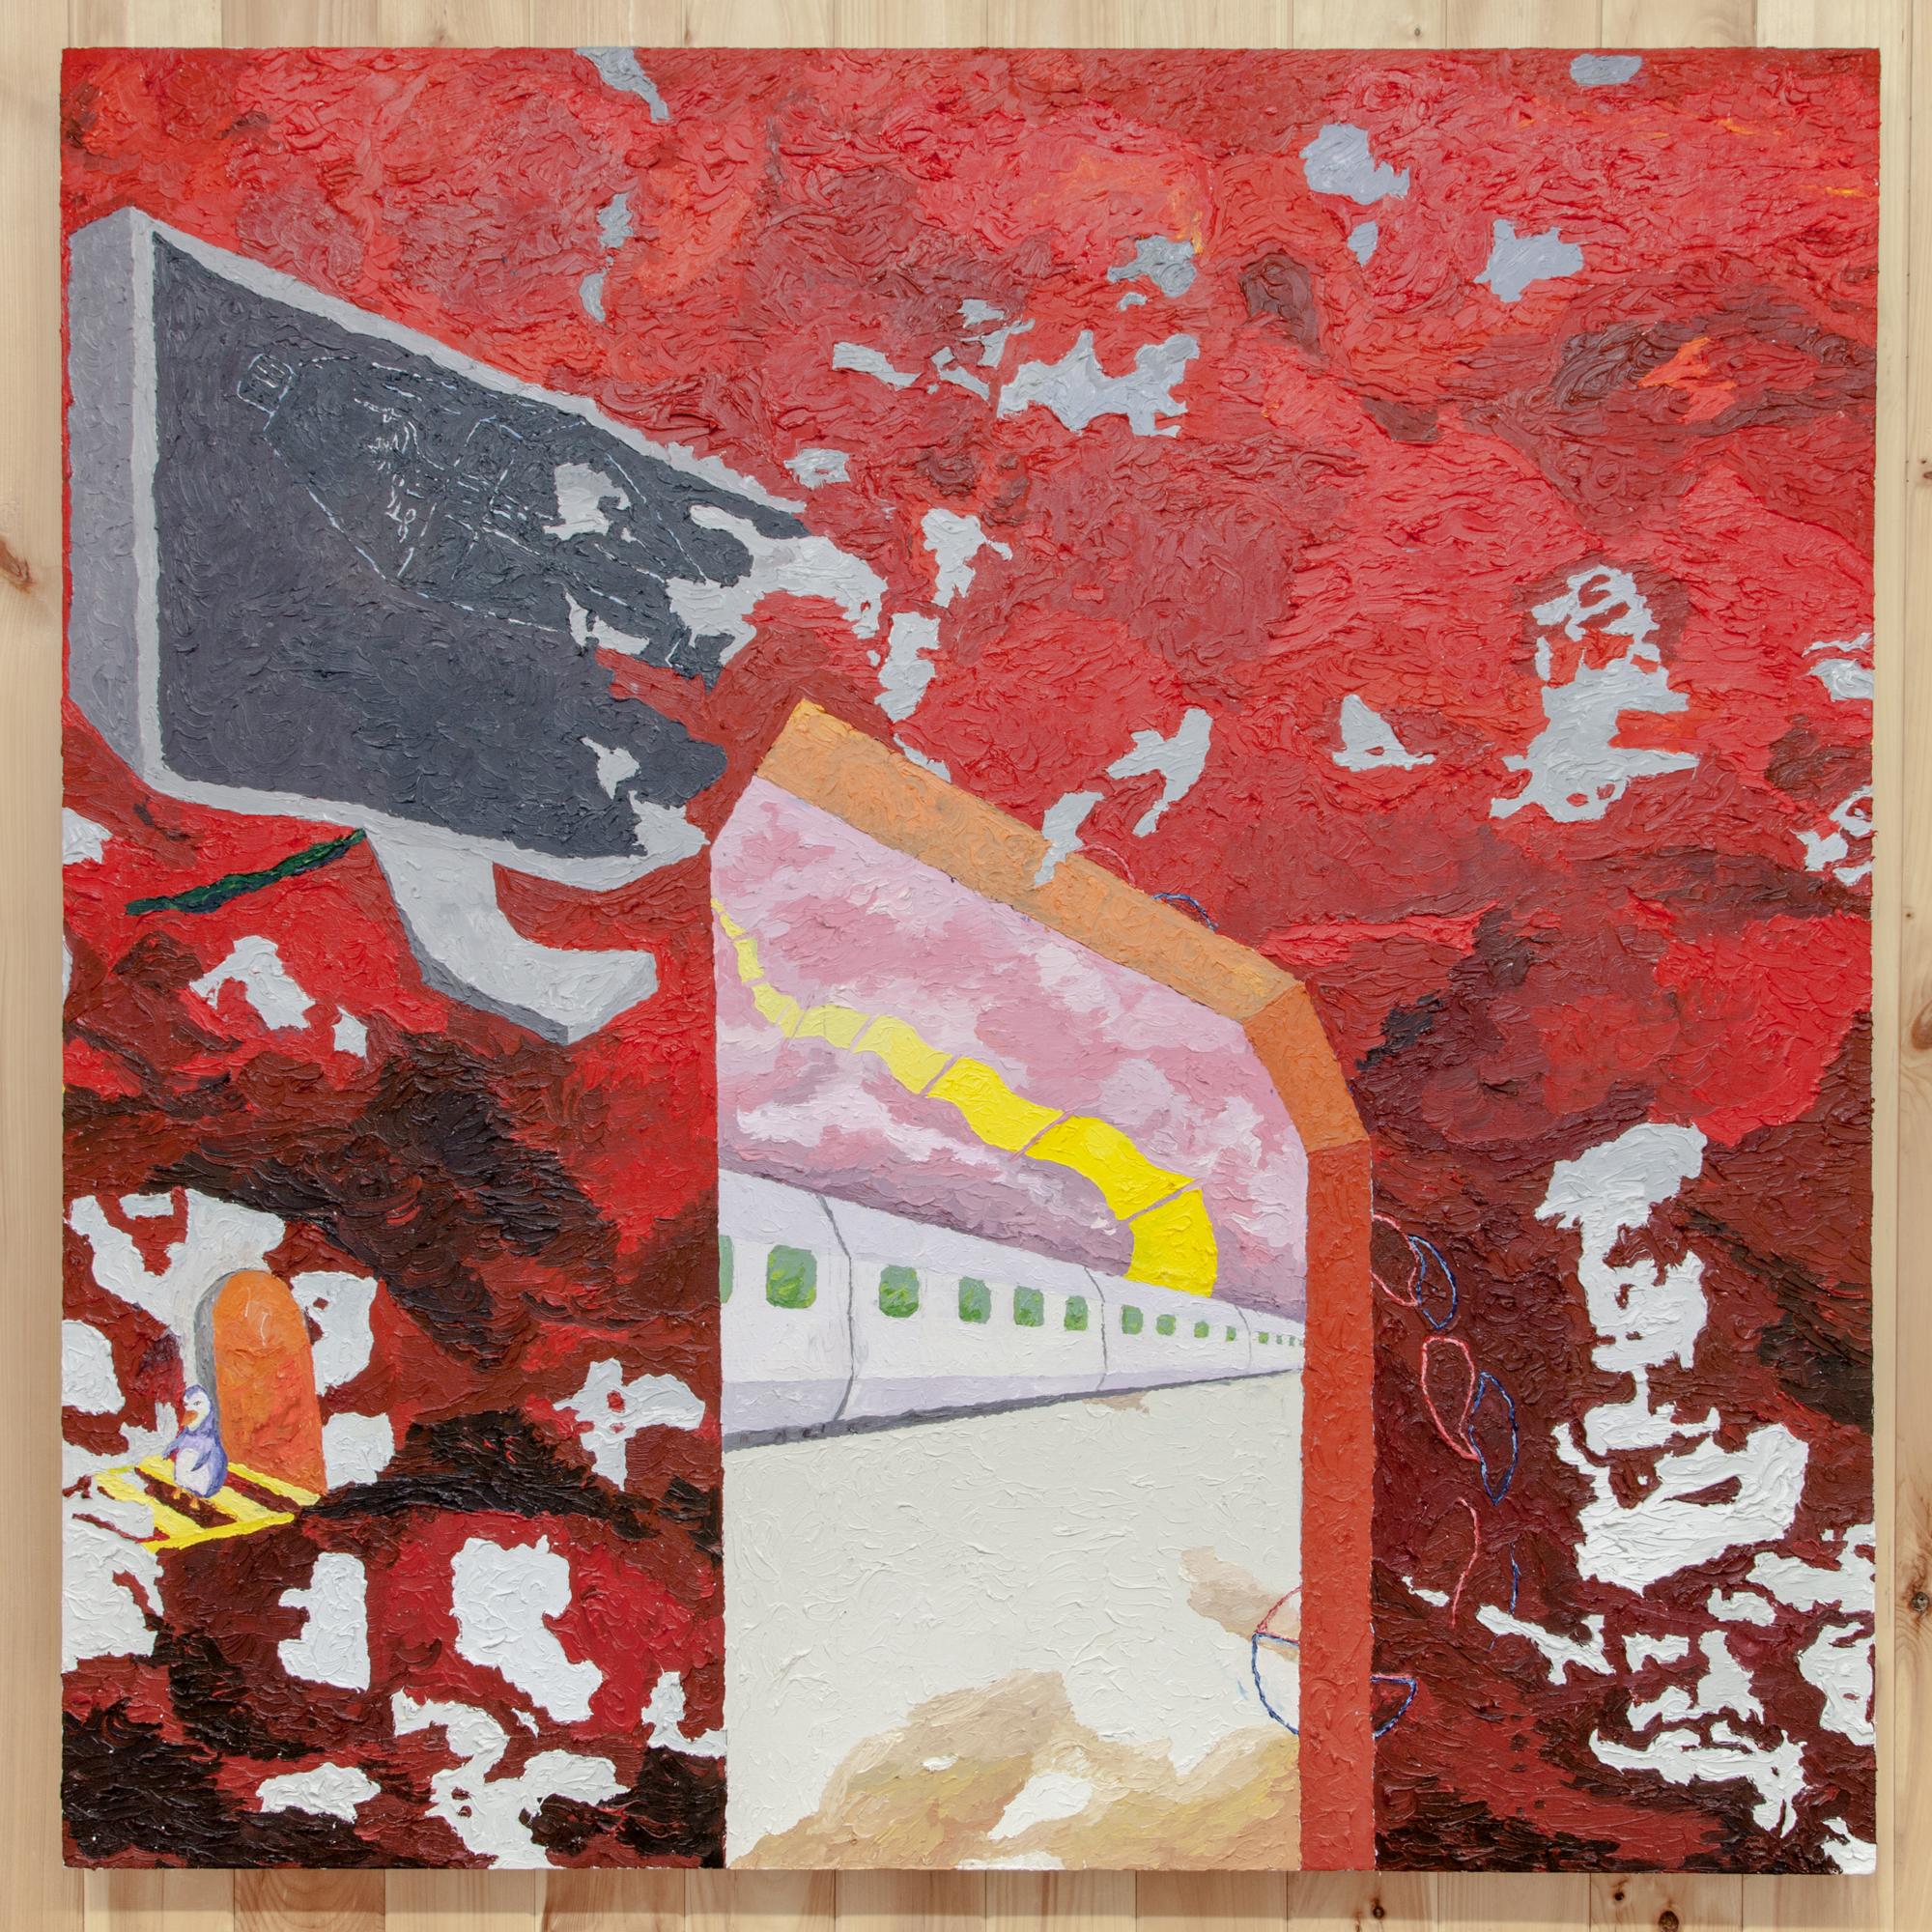 Jesse Sullivan,  Negative Land , 2018, Oil on Canvas, 60 x 60 inches